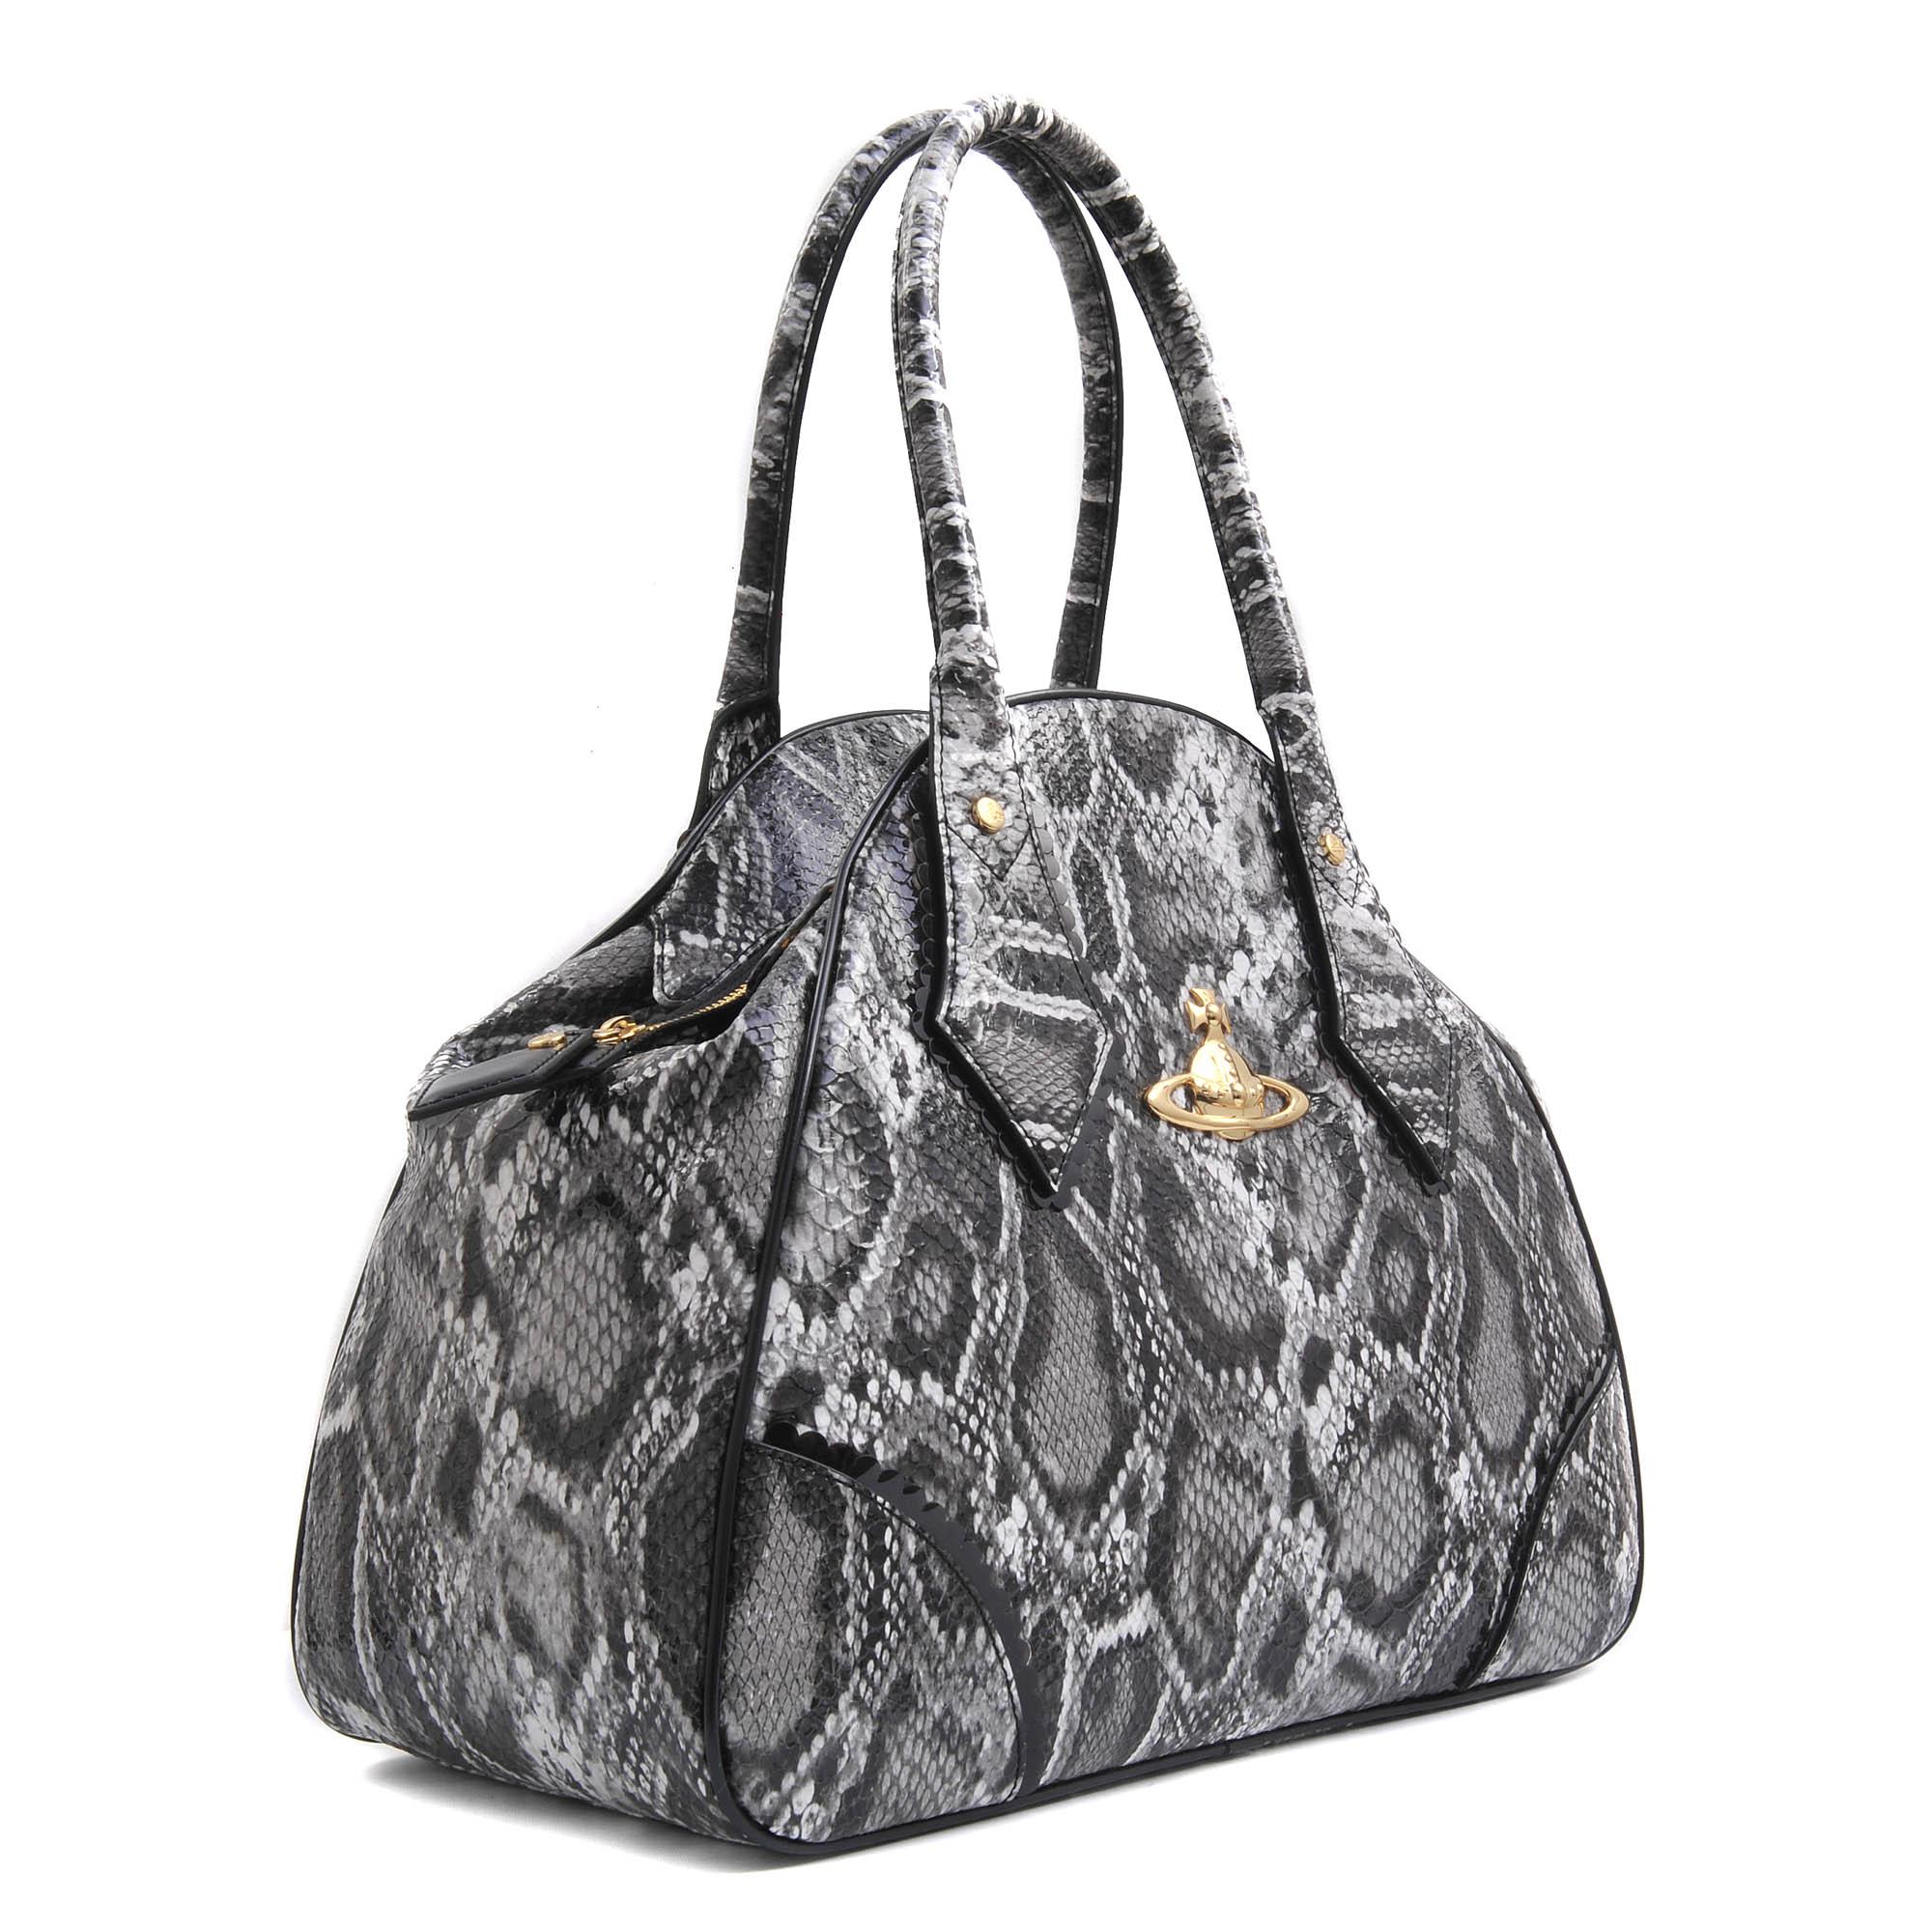 38ac9eb2e7c Vivienne Westwood Large Yasmin Frilly Snake Bag in Black - Lyst